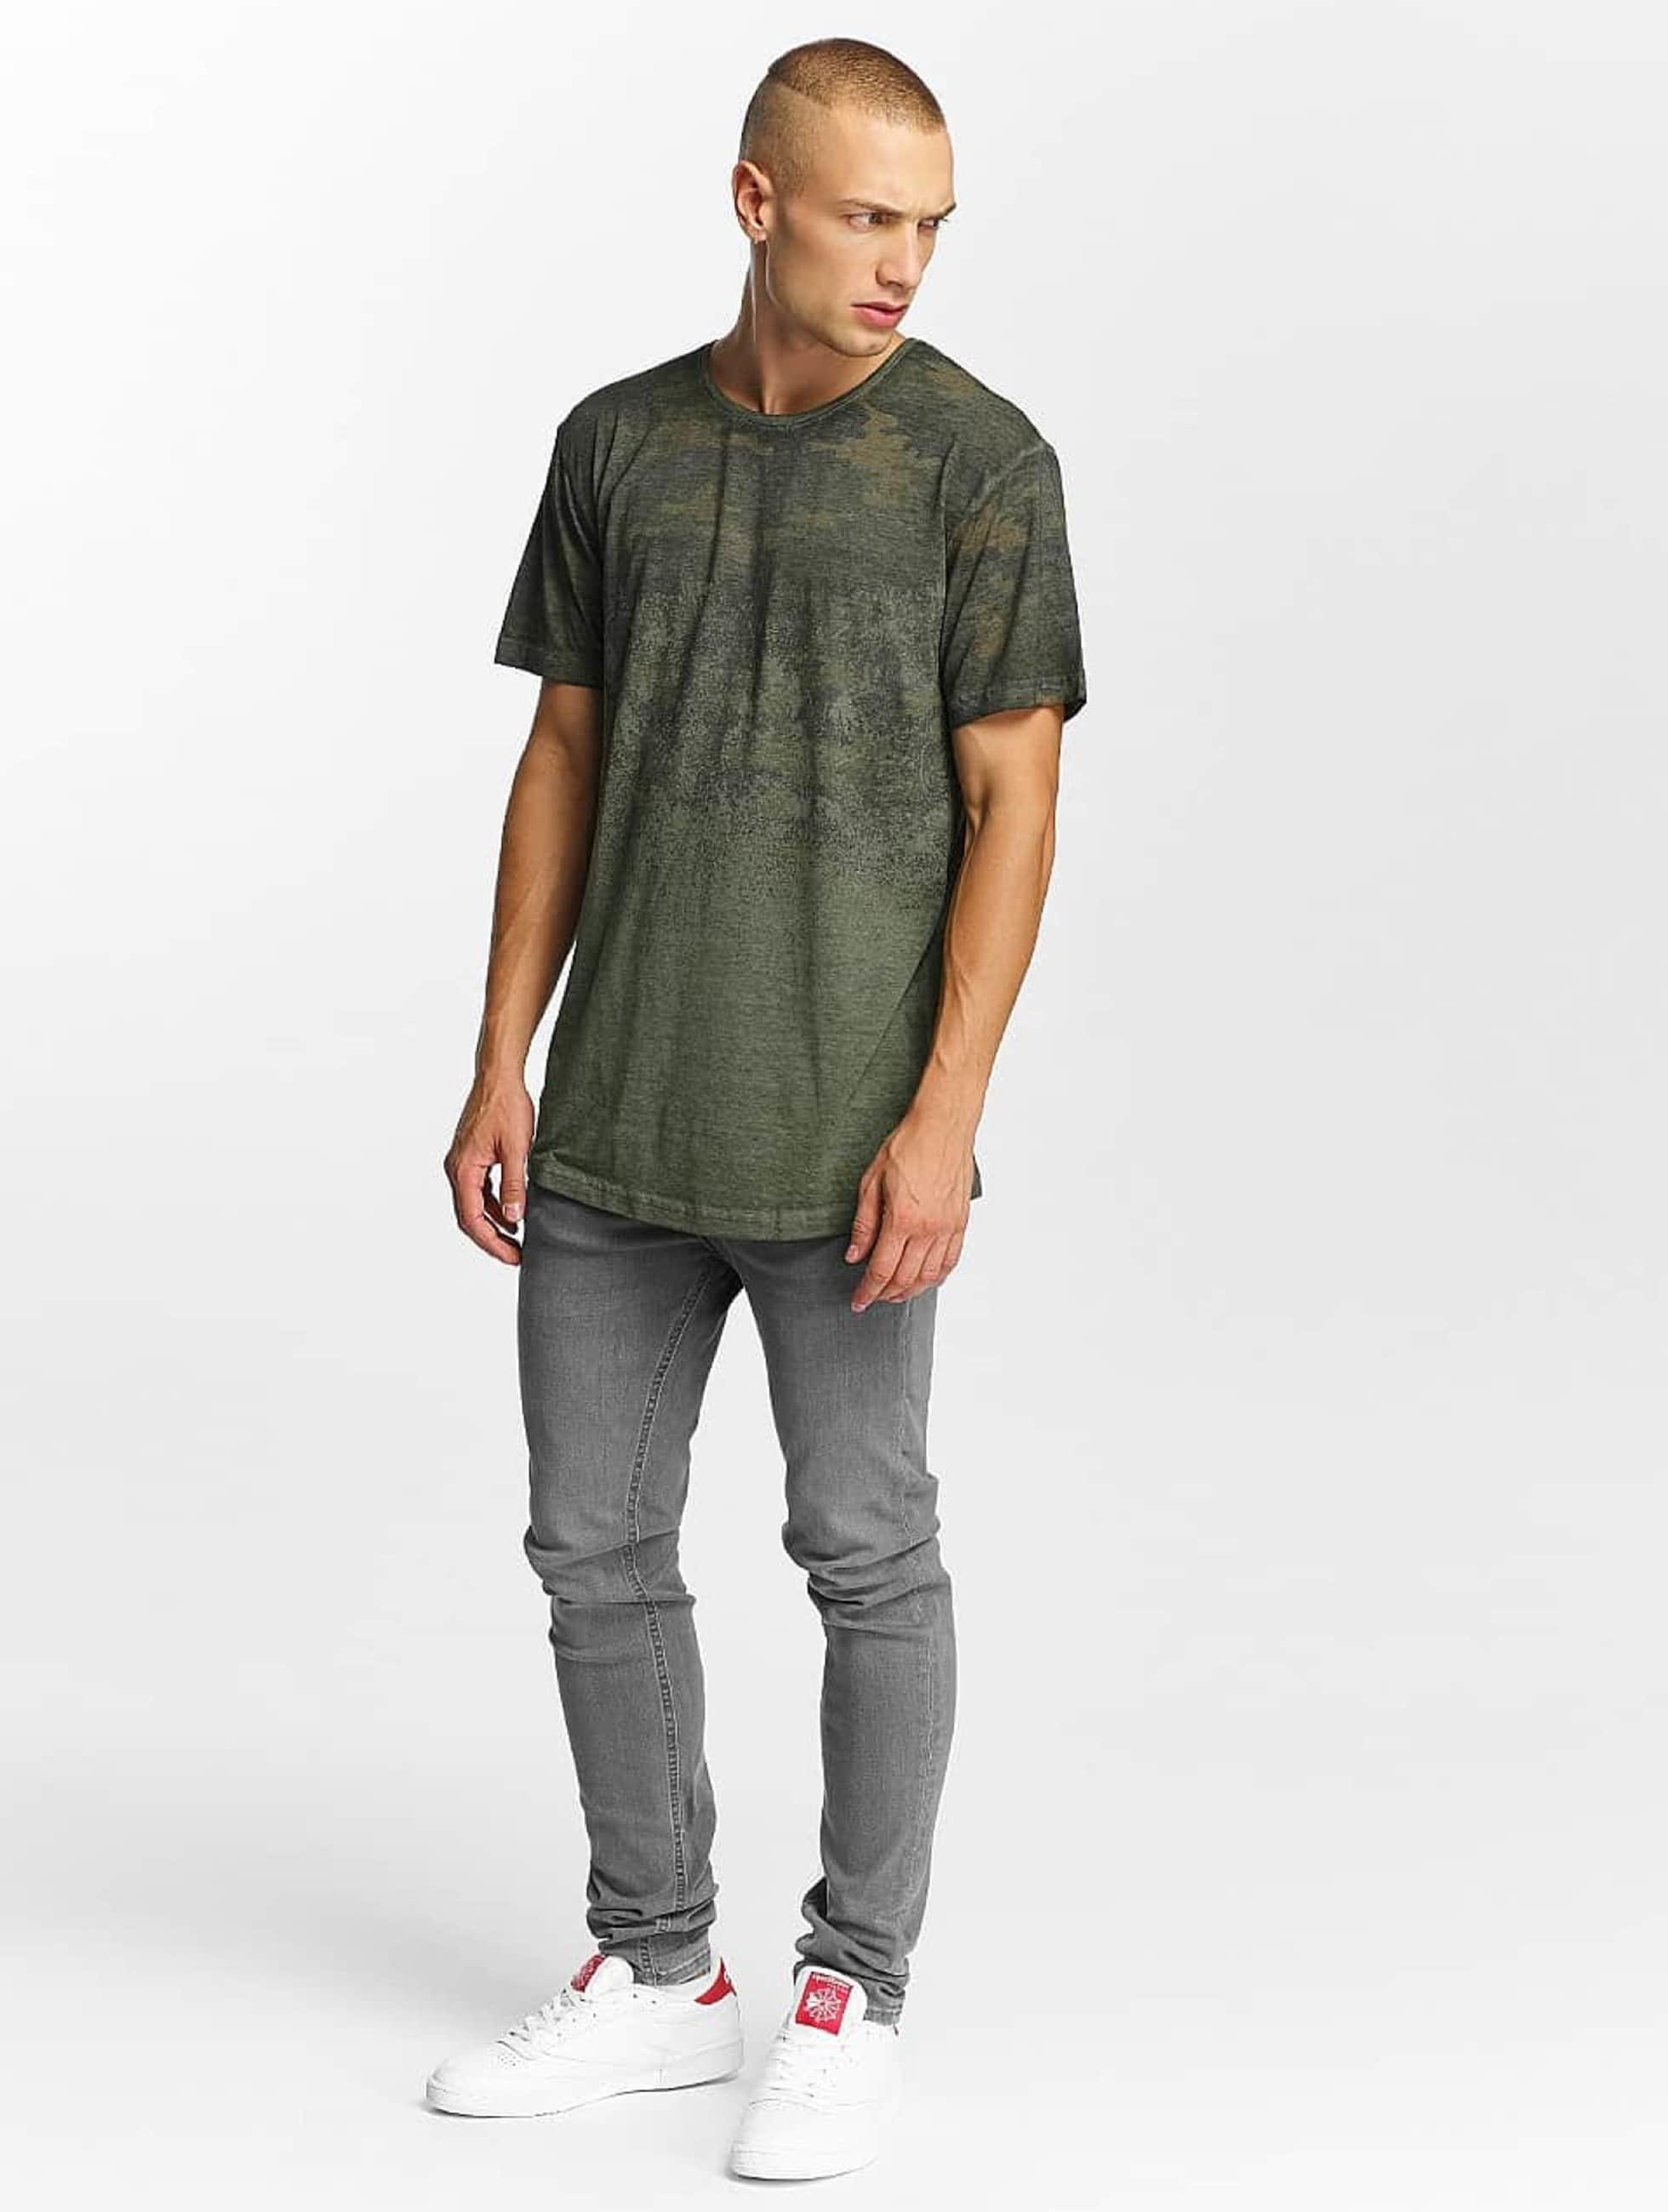 Bangastic-Uomini-Maglieria-T-shirt-Fadin-039